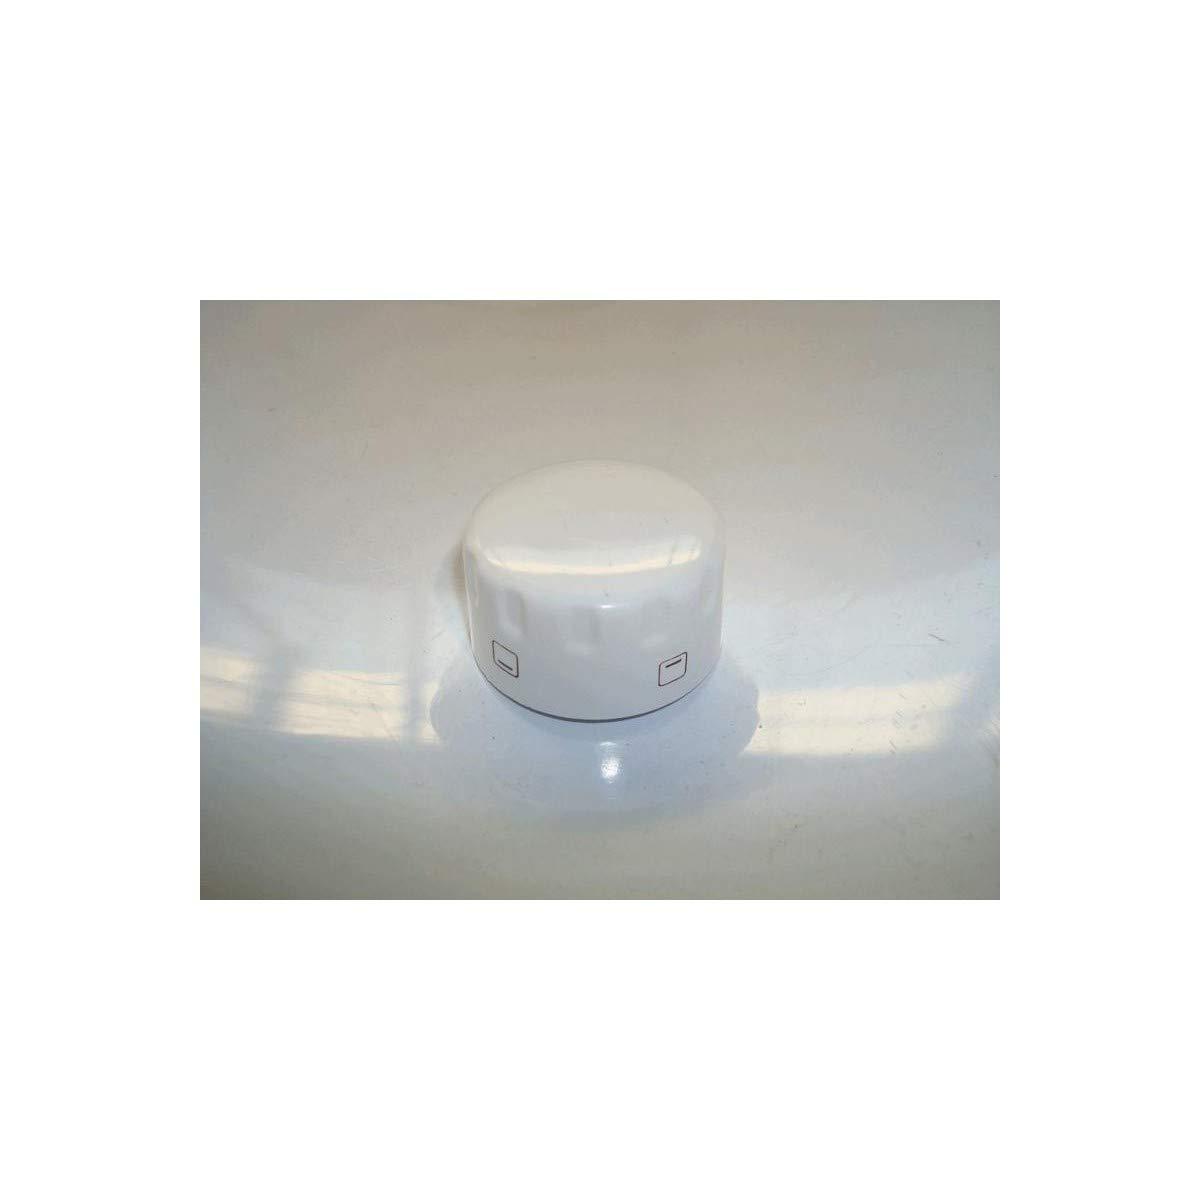 Mando Horno Teka Blanco diametro Eje 6 mm H-610: Amazon.es